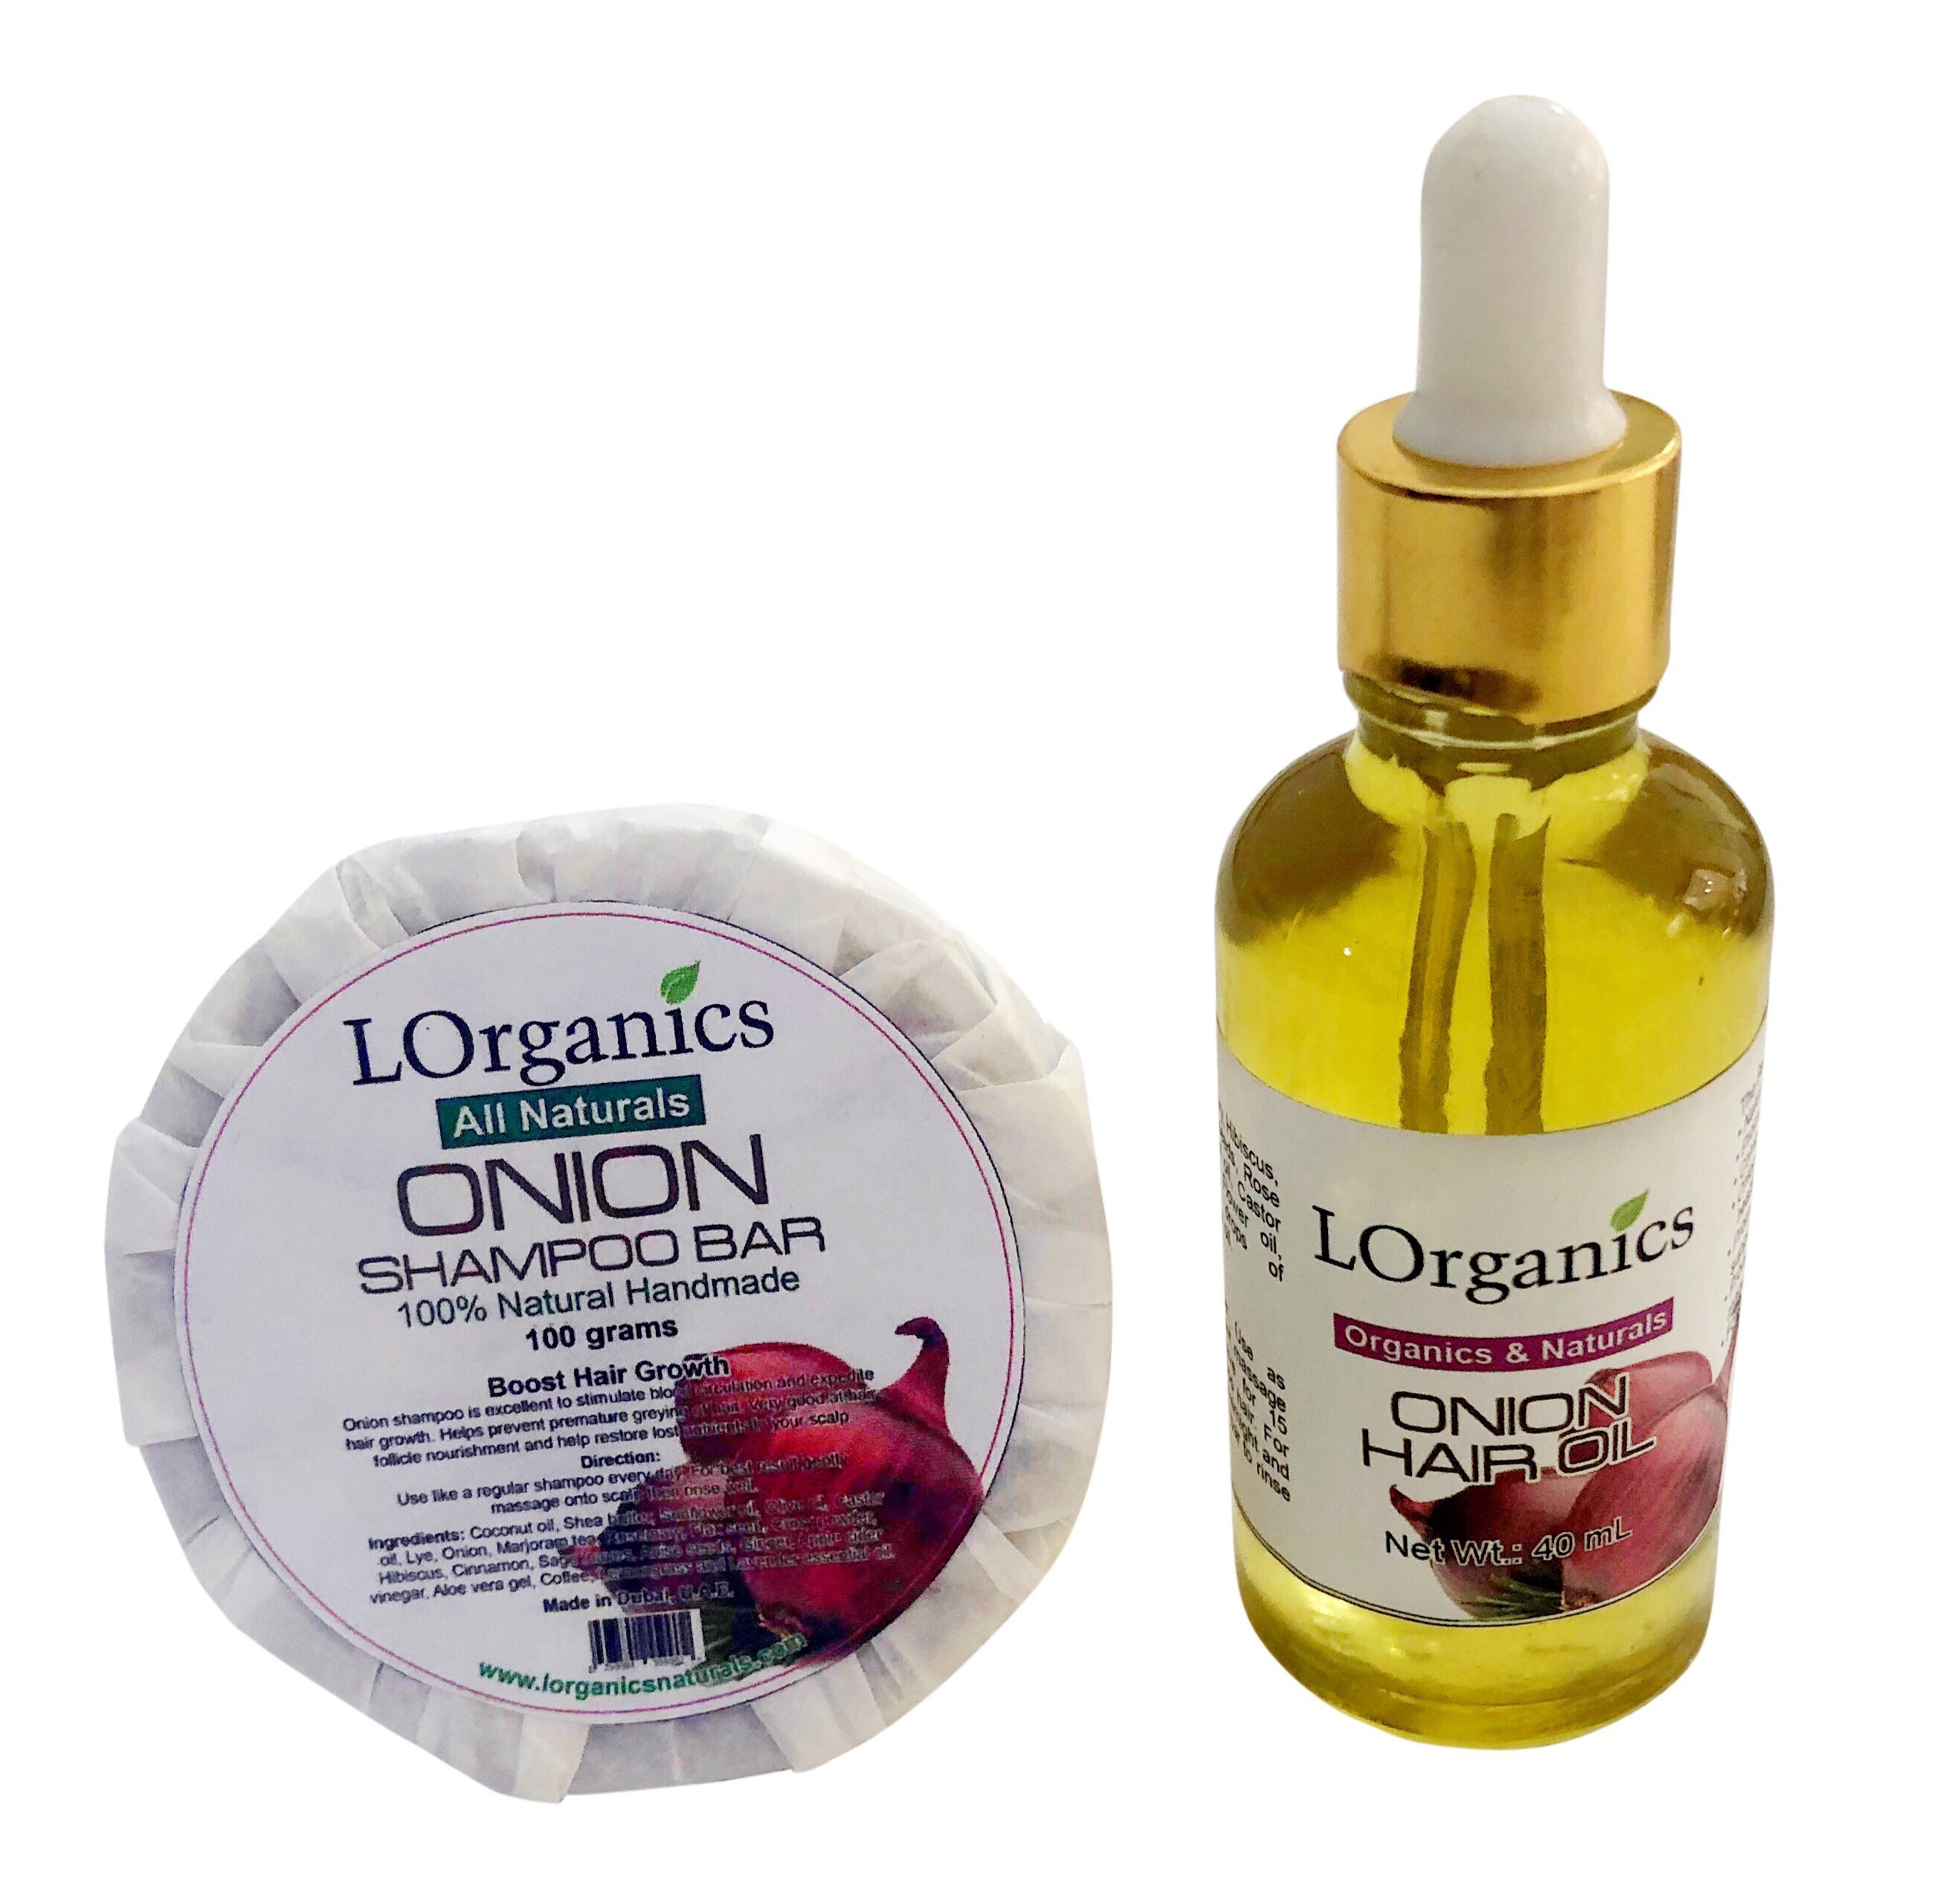 Set of Onion Shampoo & Onion Oil Boost Hair Growth